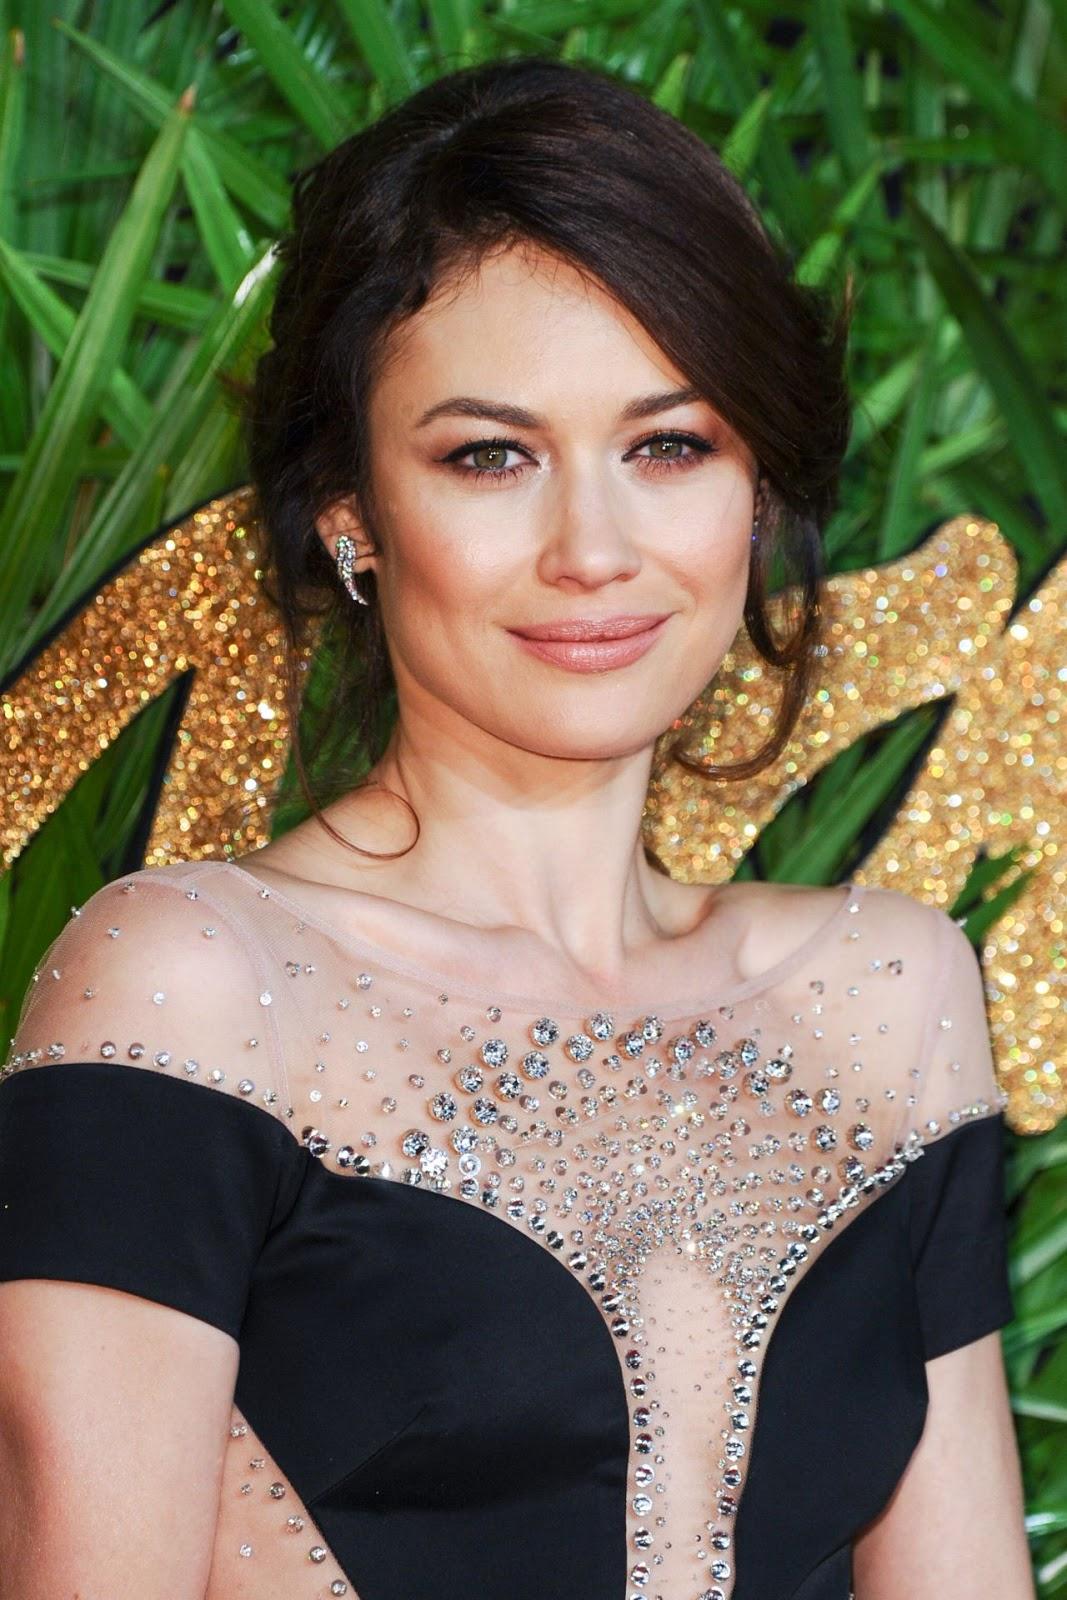 Olga Kurylenko Sexy Images In Fashion Awards 2017 In ... Olga Kurylenko